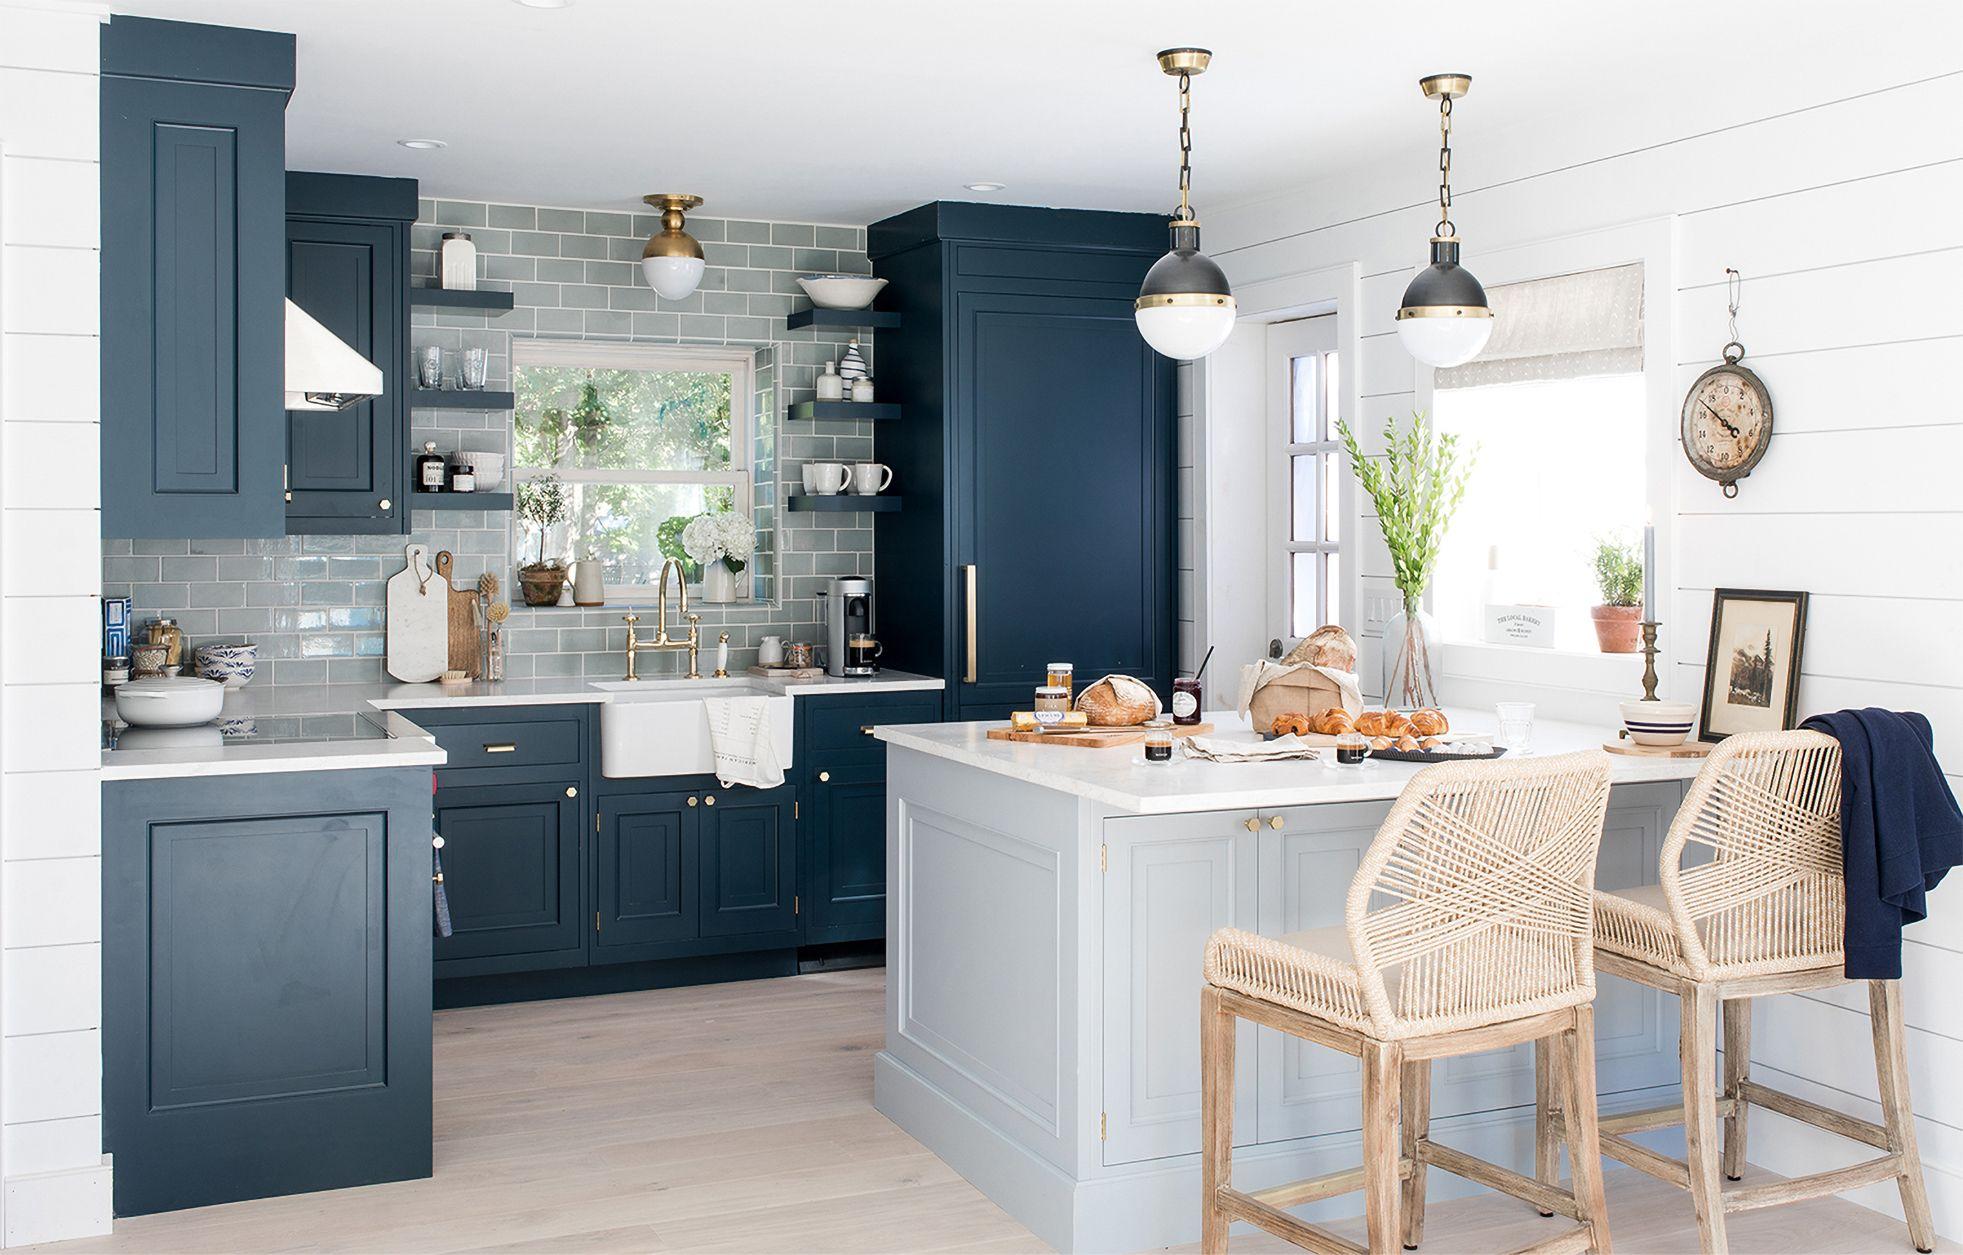 idee cuisine deco bord de mer mobilier bleu fonce